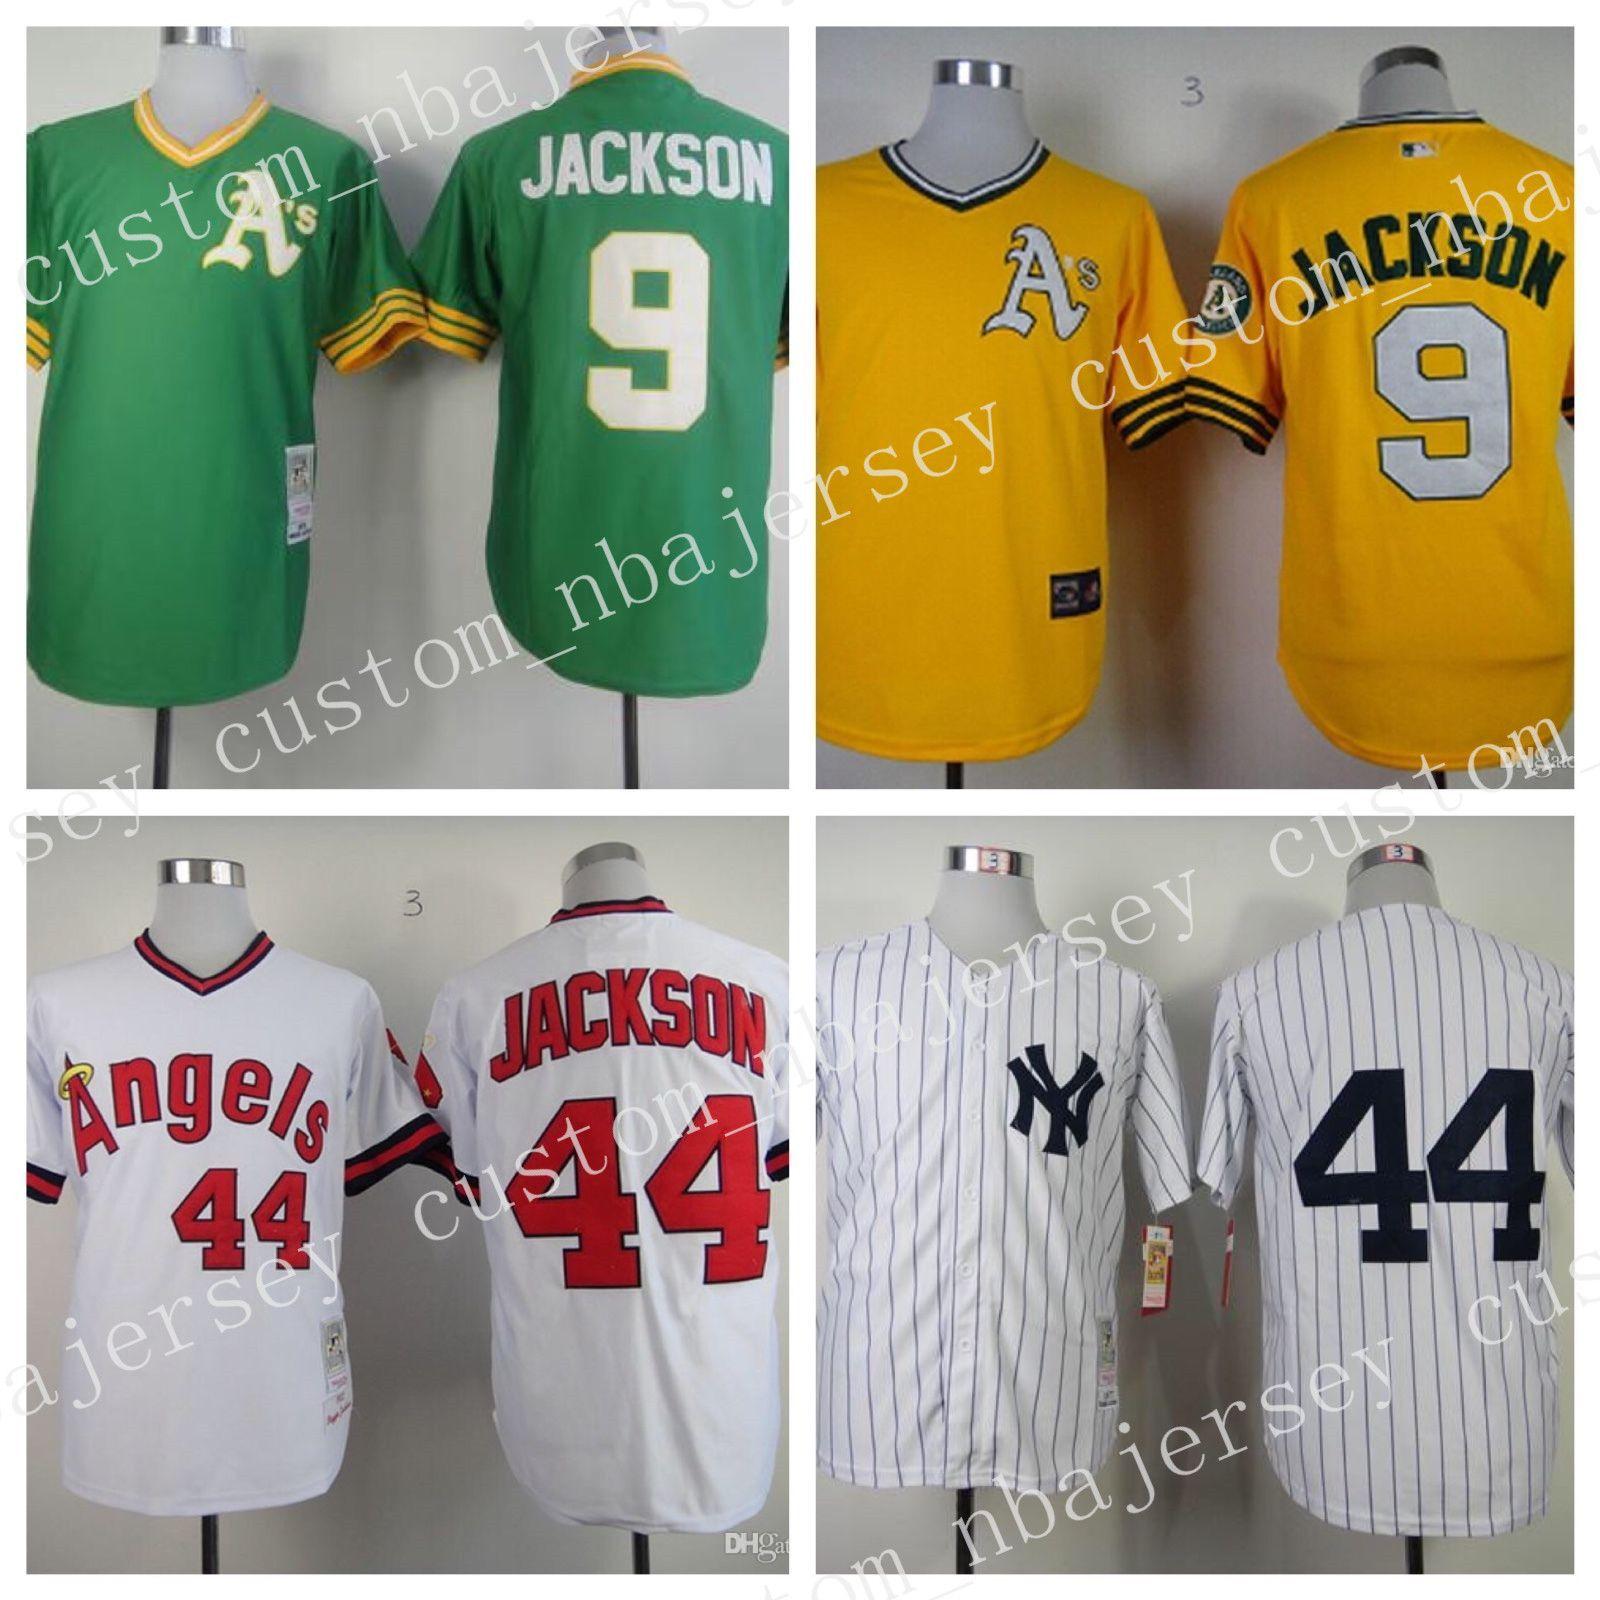 2019 Cheap Wholesale Reggie Jackson Baseball Jerseys Sizes S 3XL Stitched  High Quality From Custom nbajersey 02a2880f24f